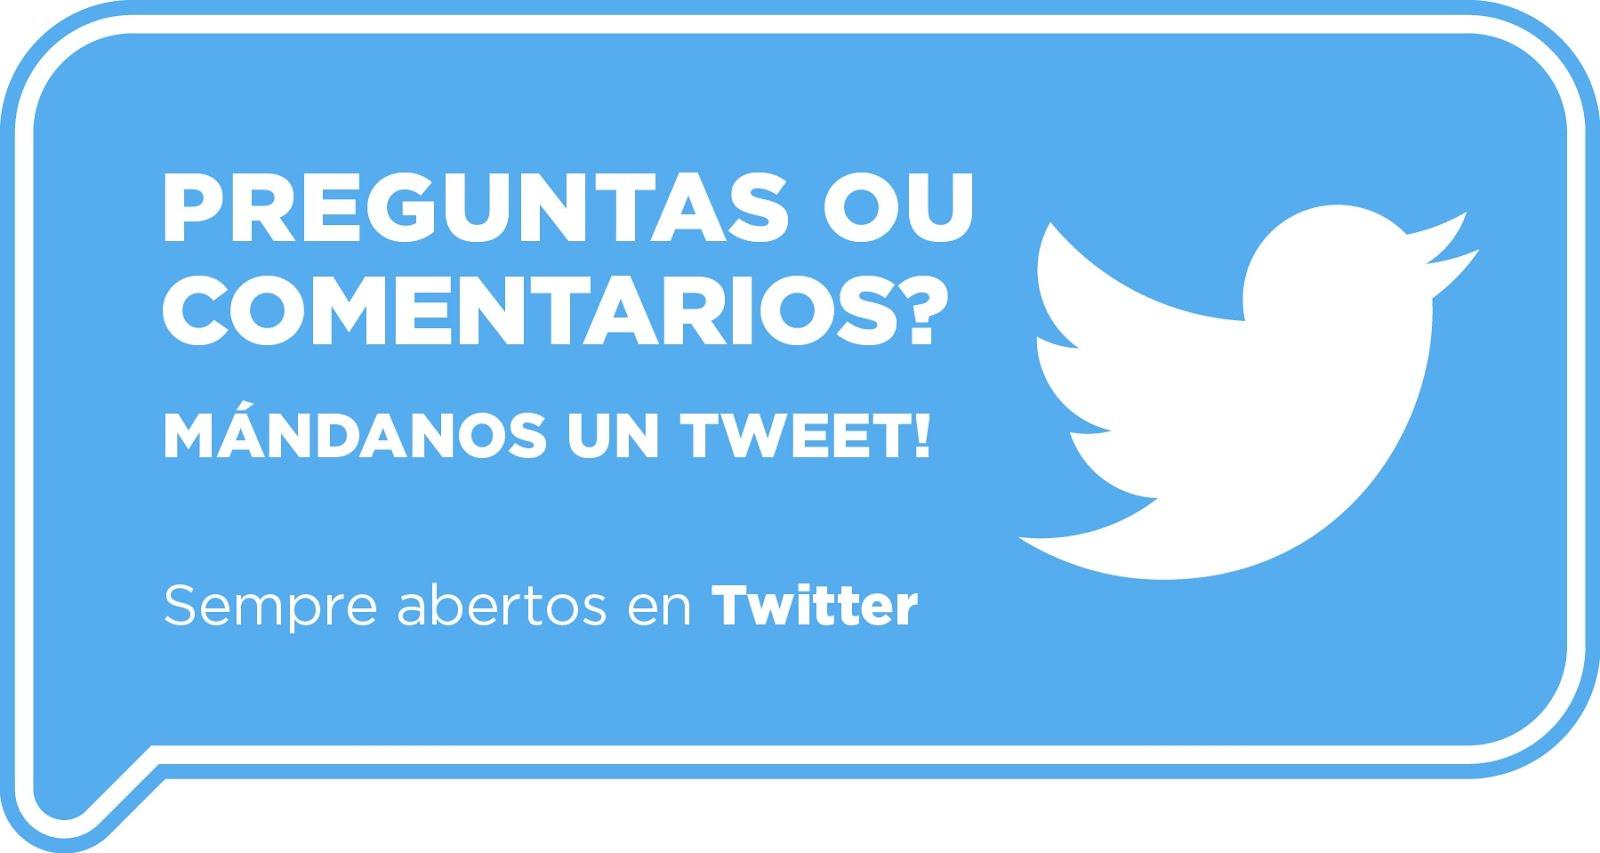 @TiendaLanuxos en Twiter